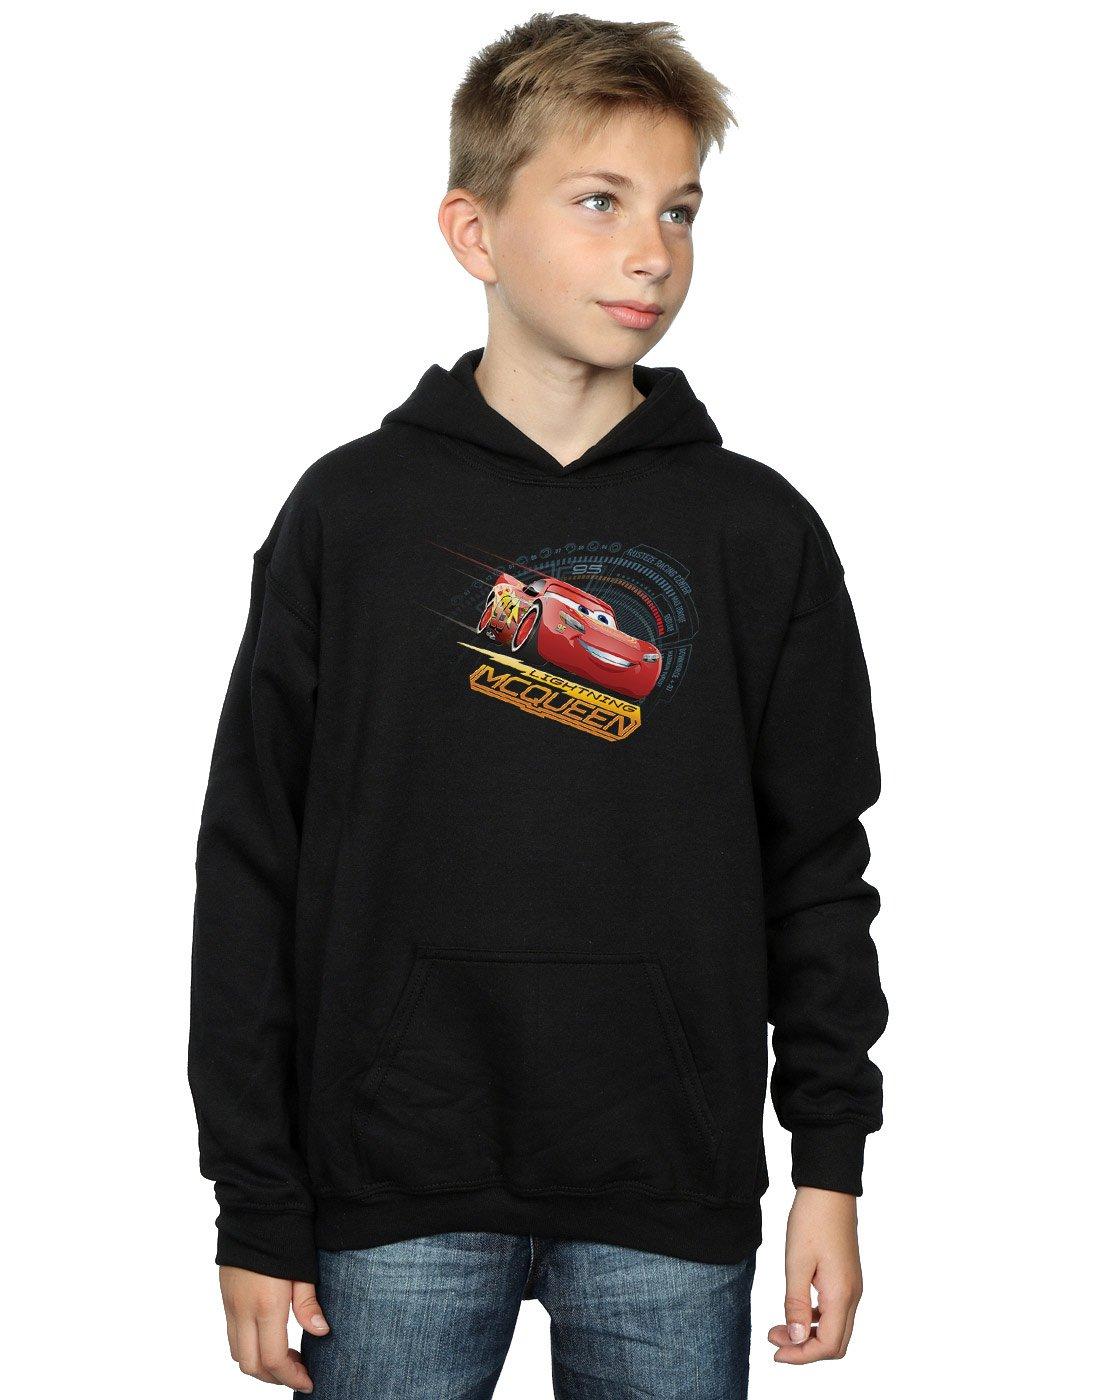 95 Mcqueen Kids Pullover Hoodie Disney Cars Official Sport Grey 5-6 Years